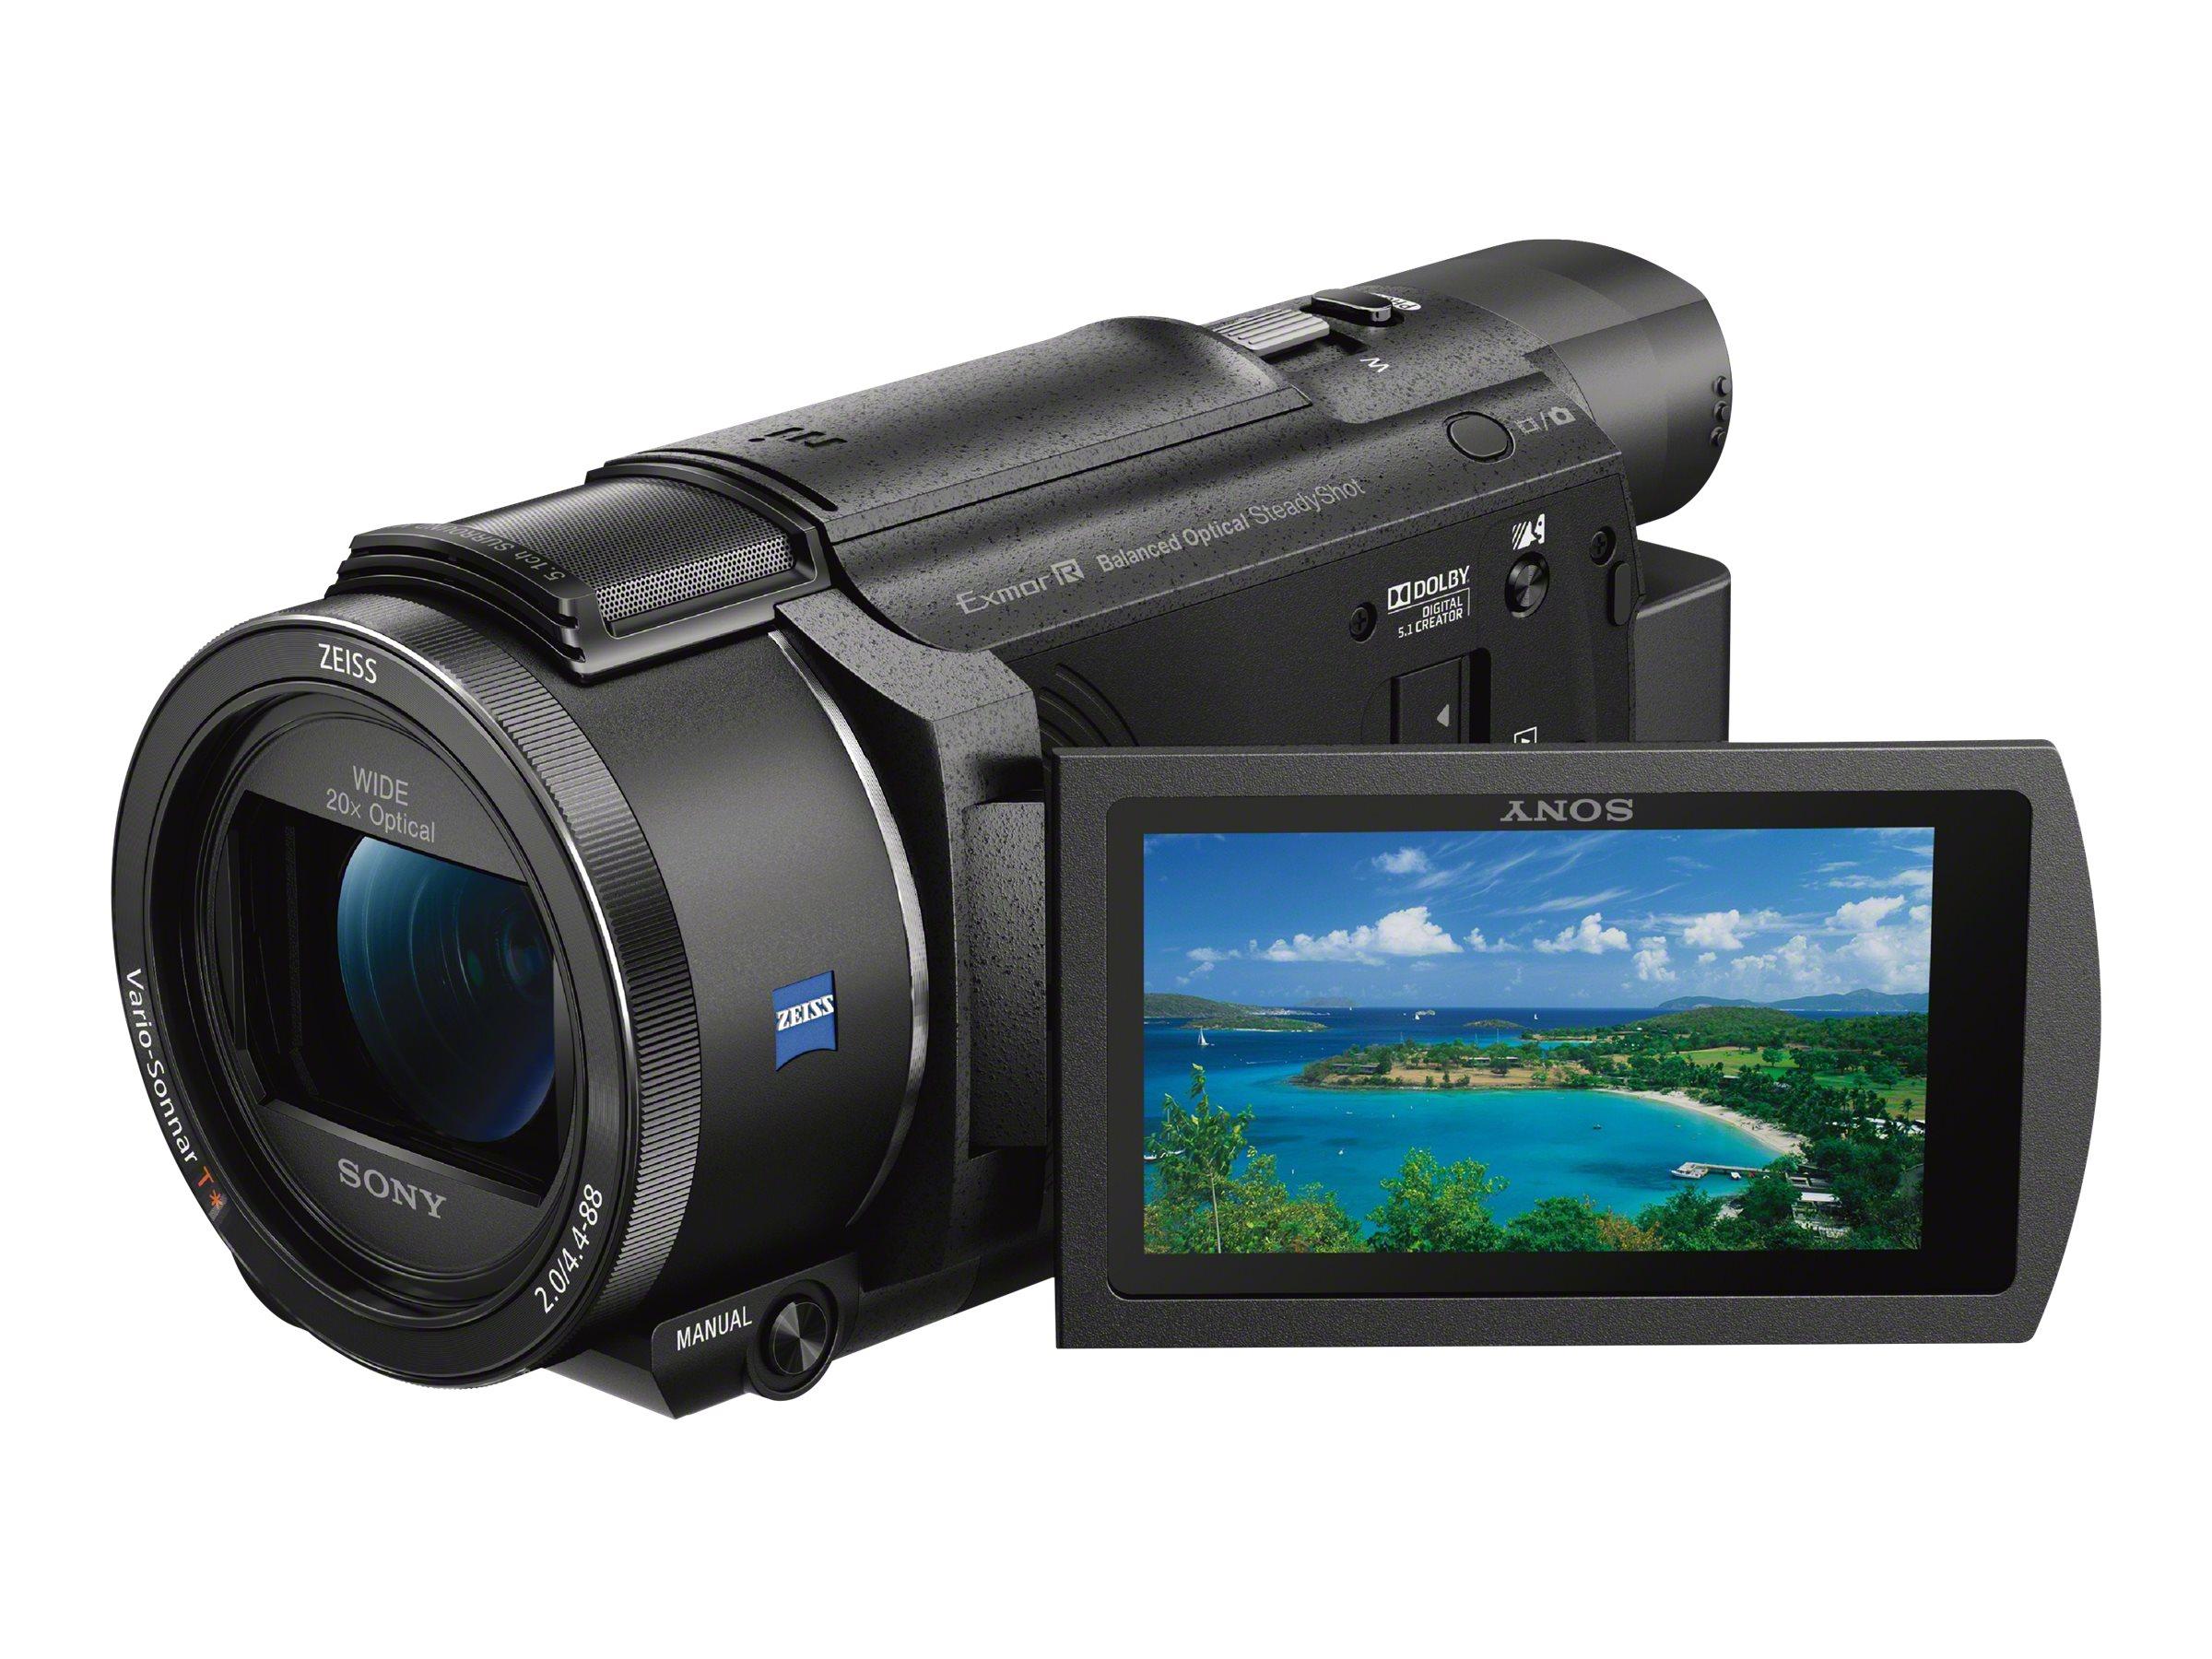 Sony Handycam FDR-AX53 - Camcorder